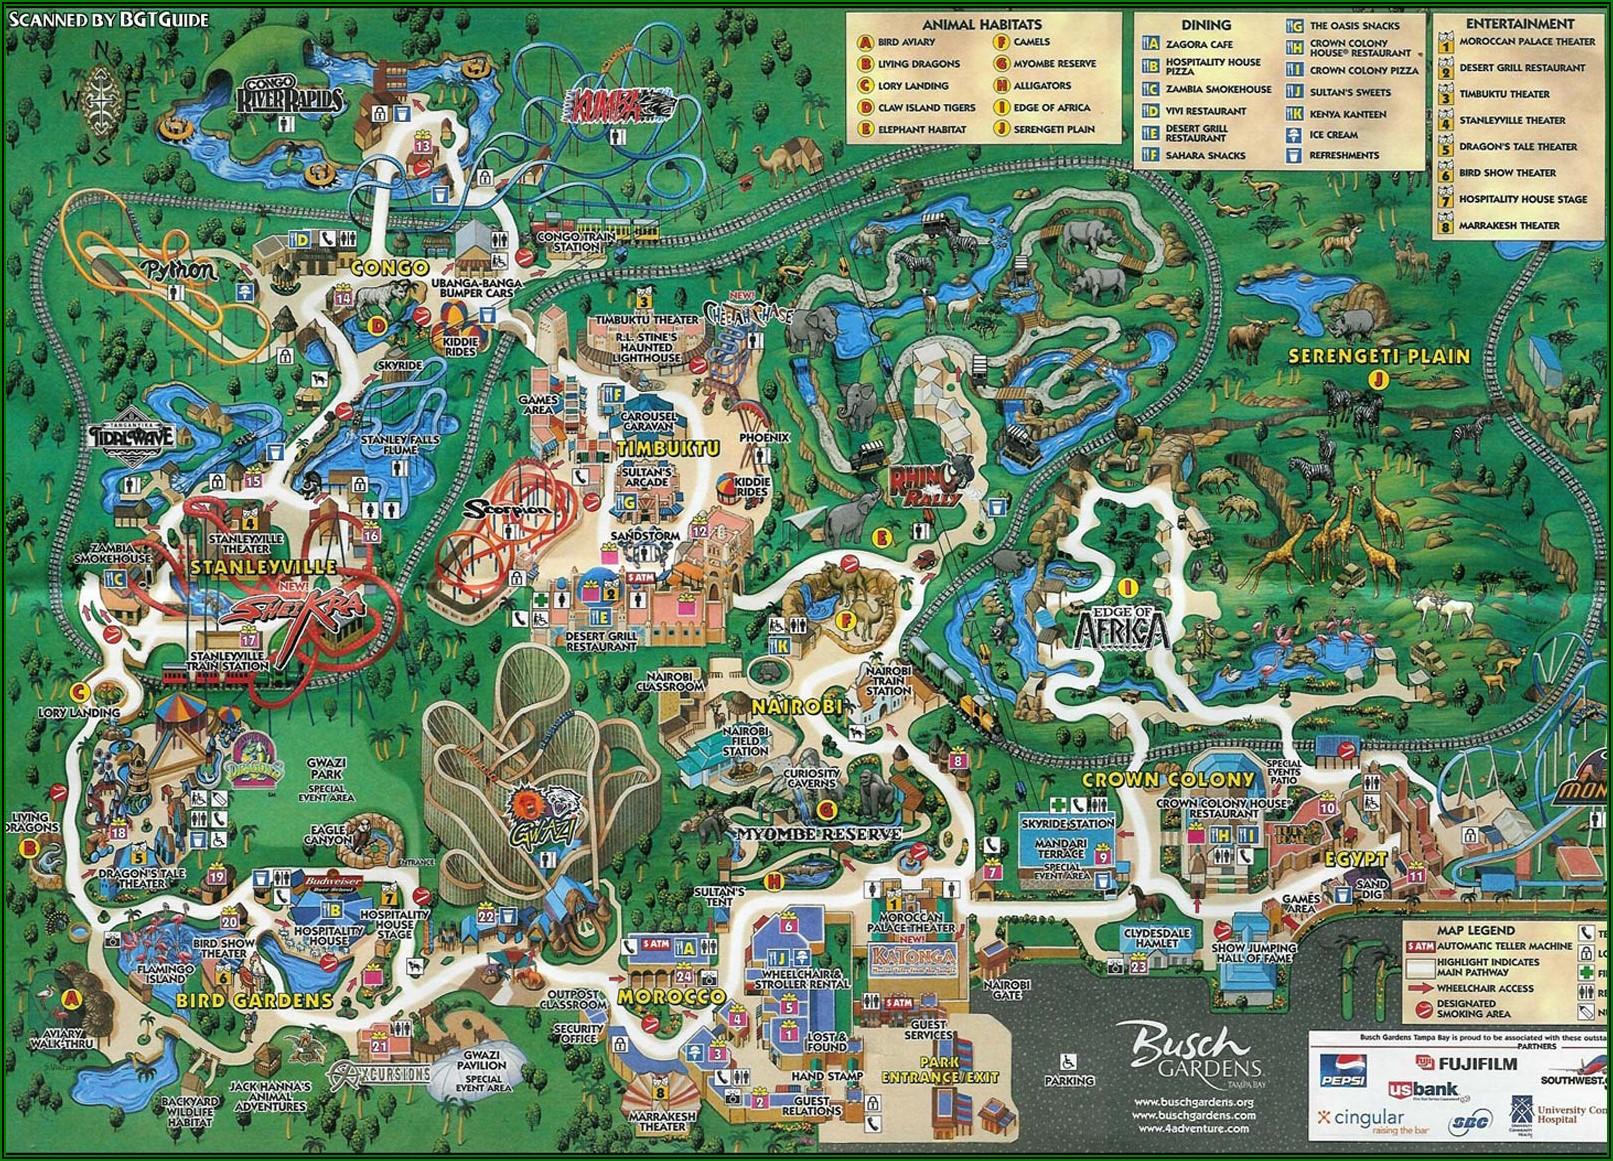 Busch Gardens Tampa Park Map 2019